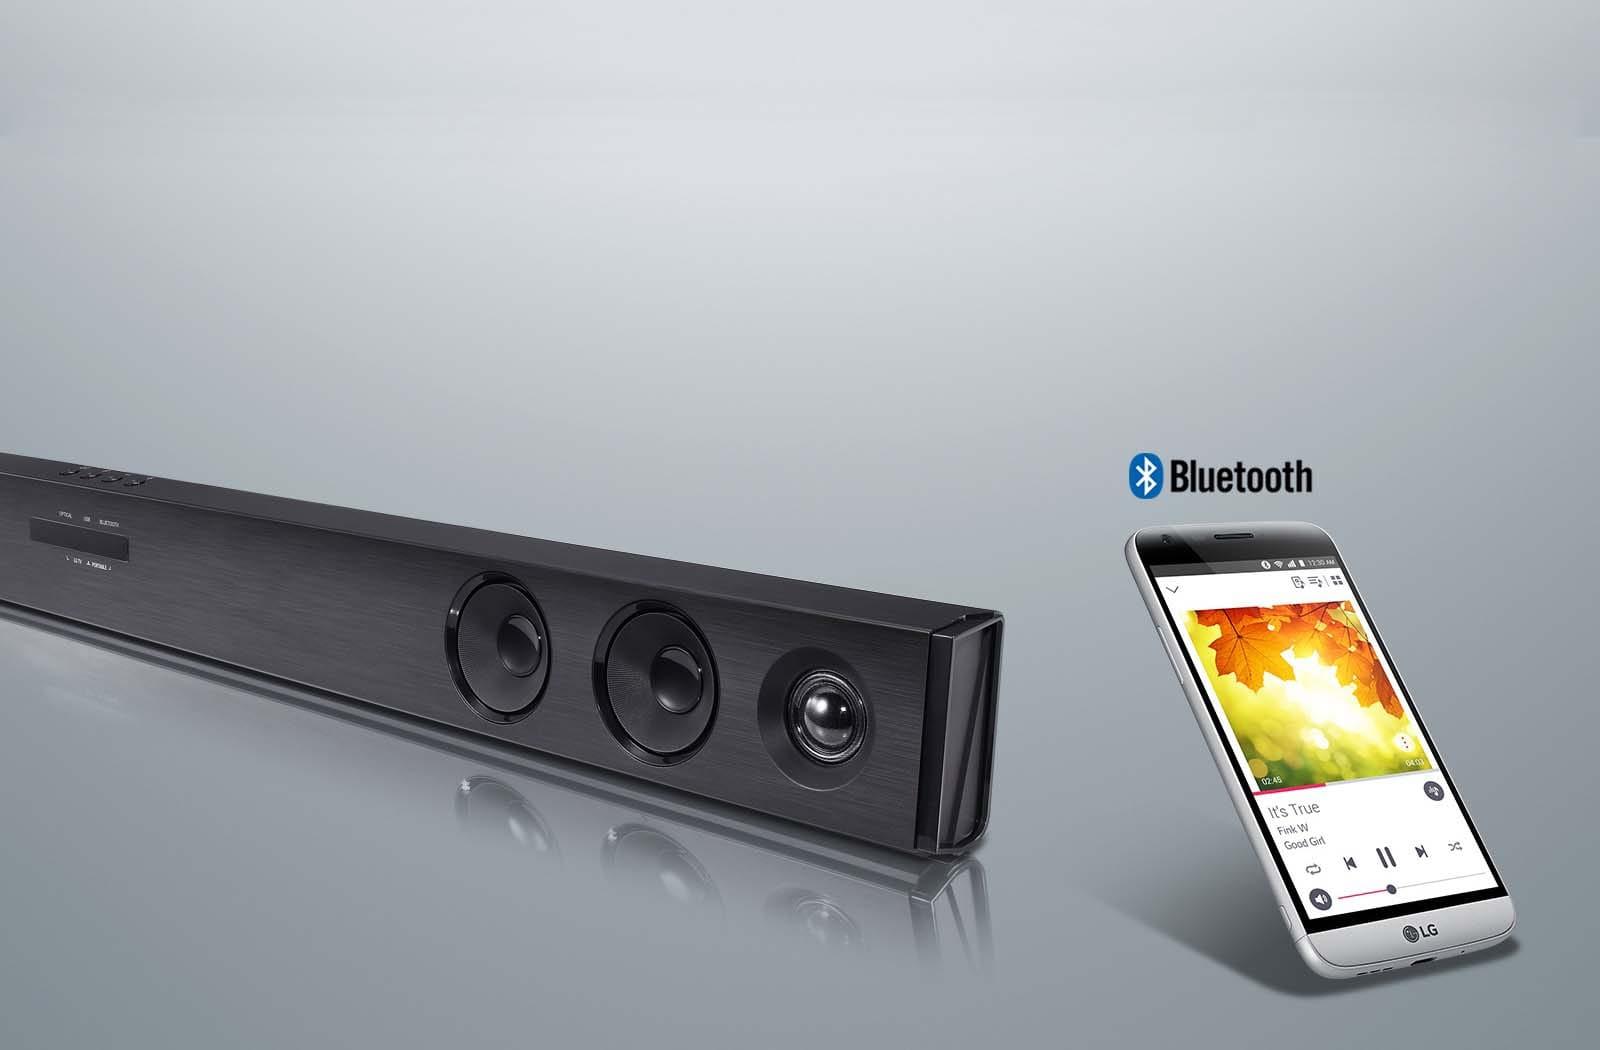 05_SJ3_Bluetooth-Stand-by_pc_v2-min